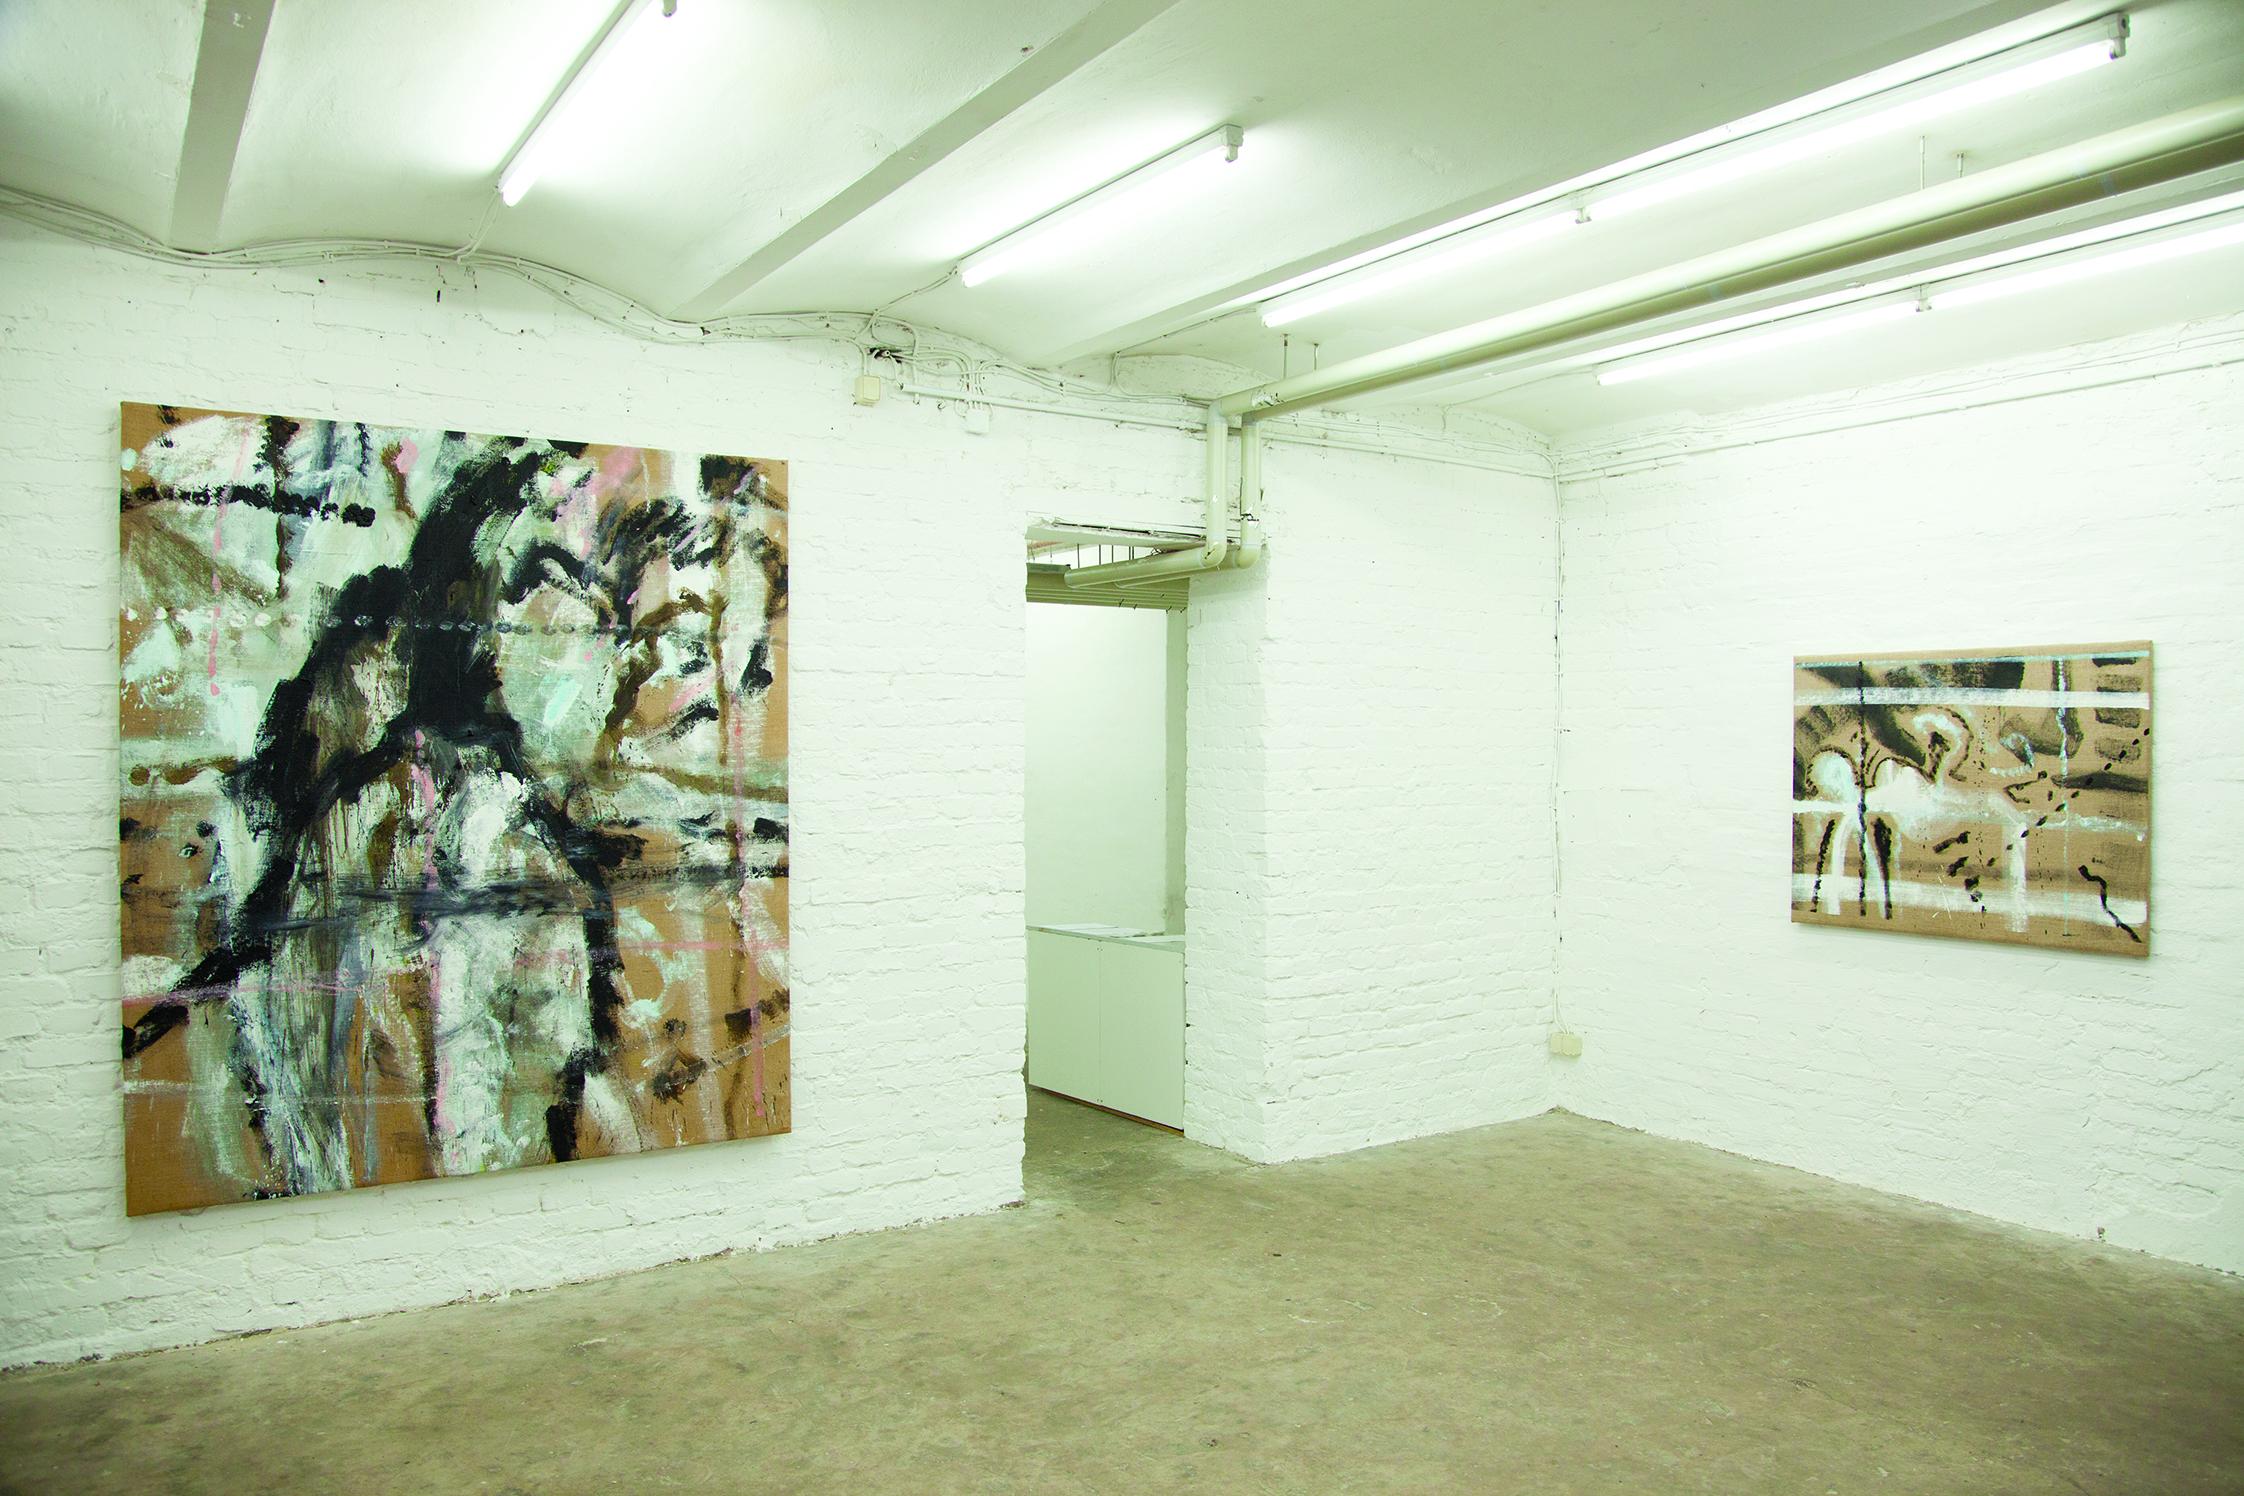 Exhibition at Dzialdov 2016, Berlin, Ali Labgaa